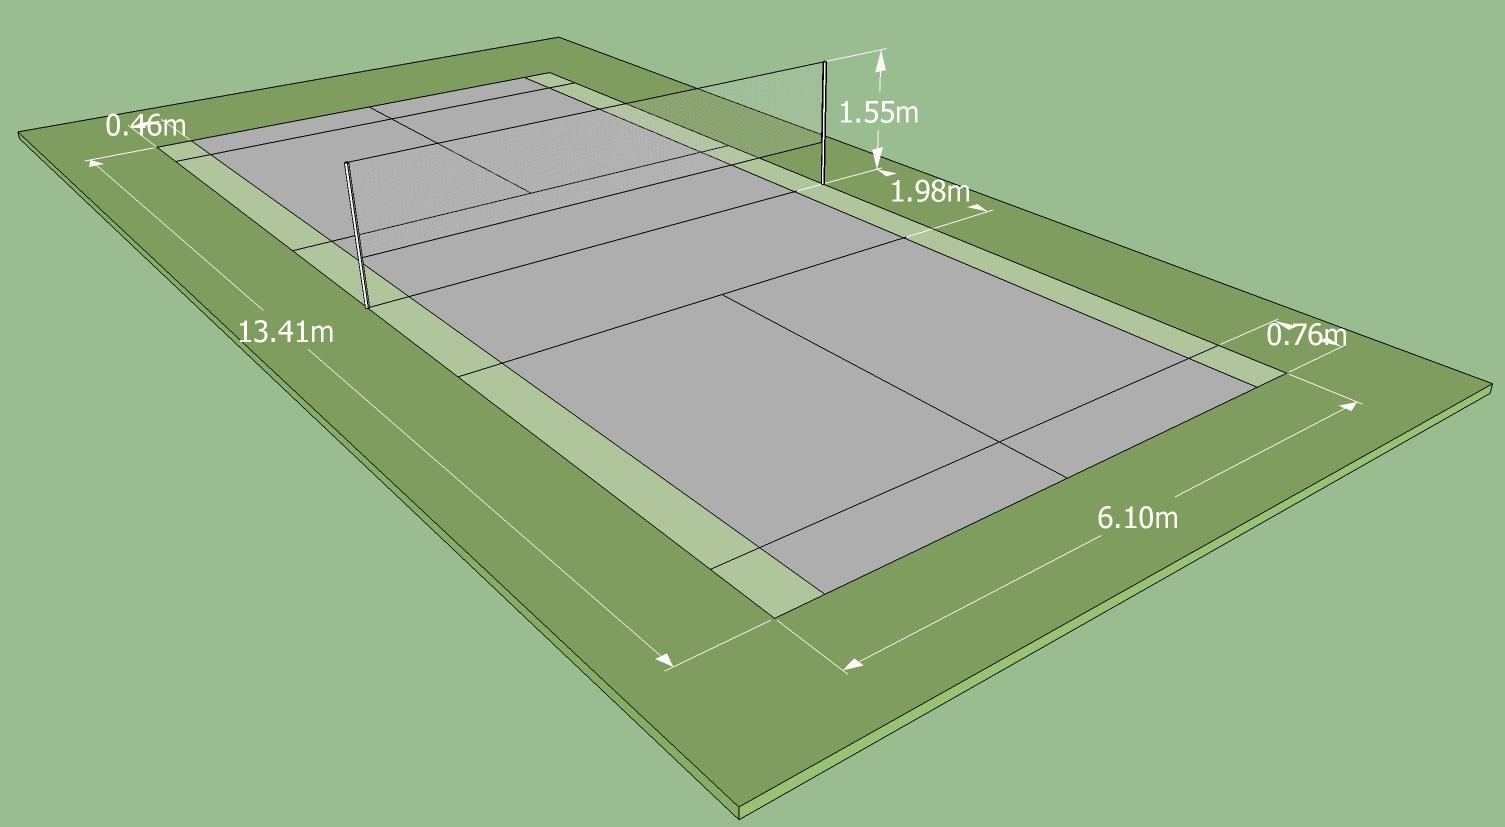 Badminton net measurement